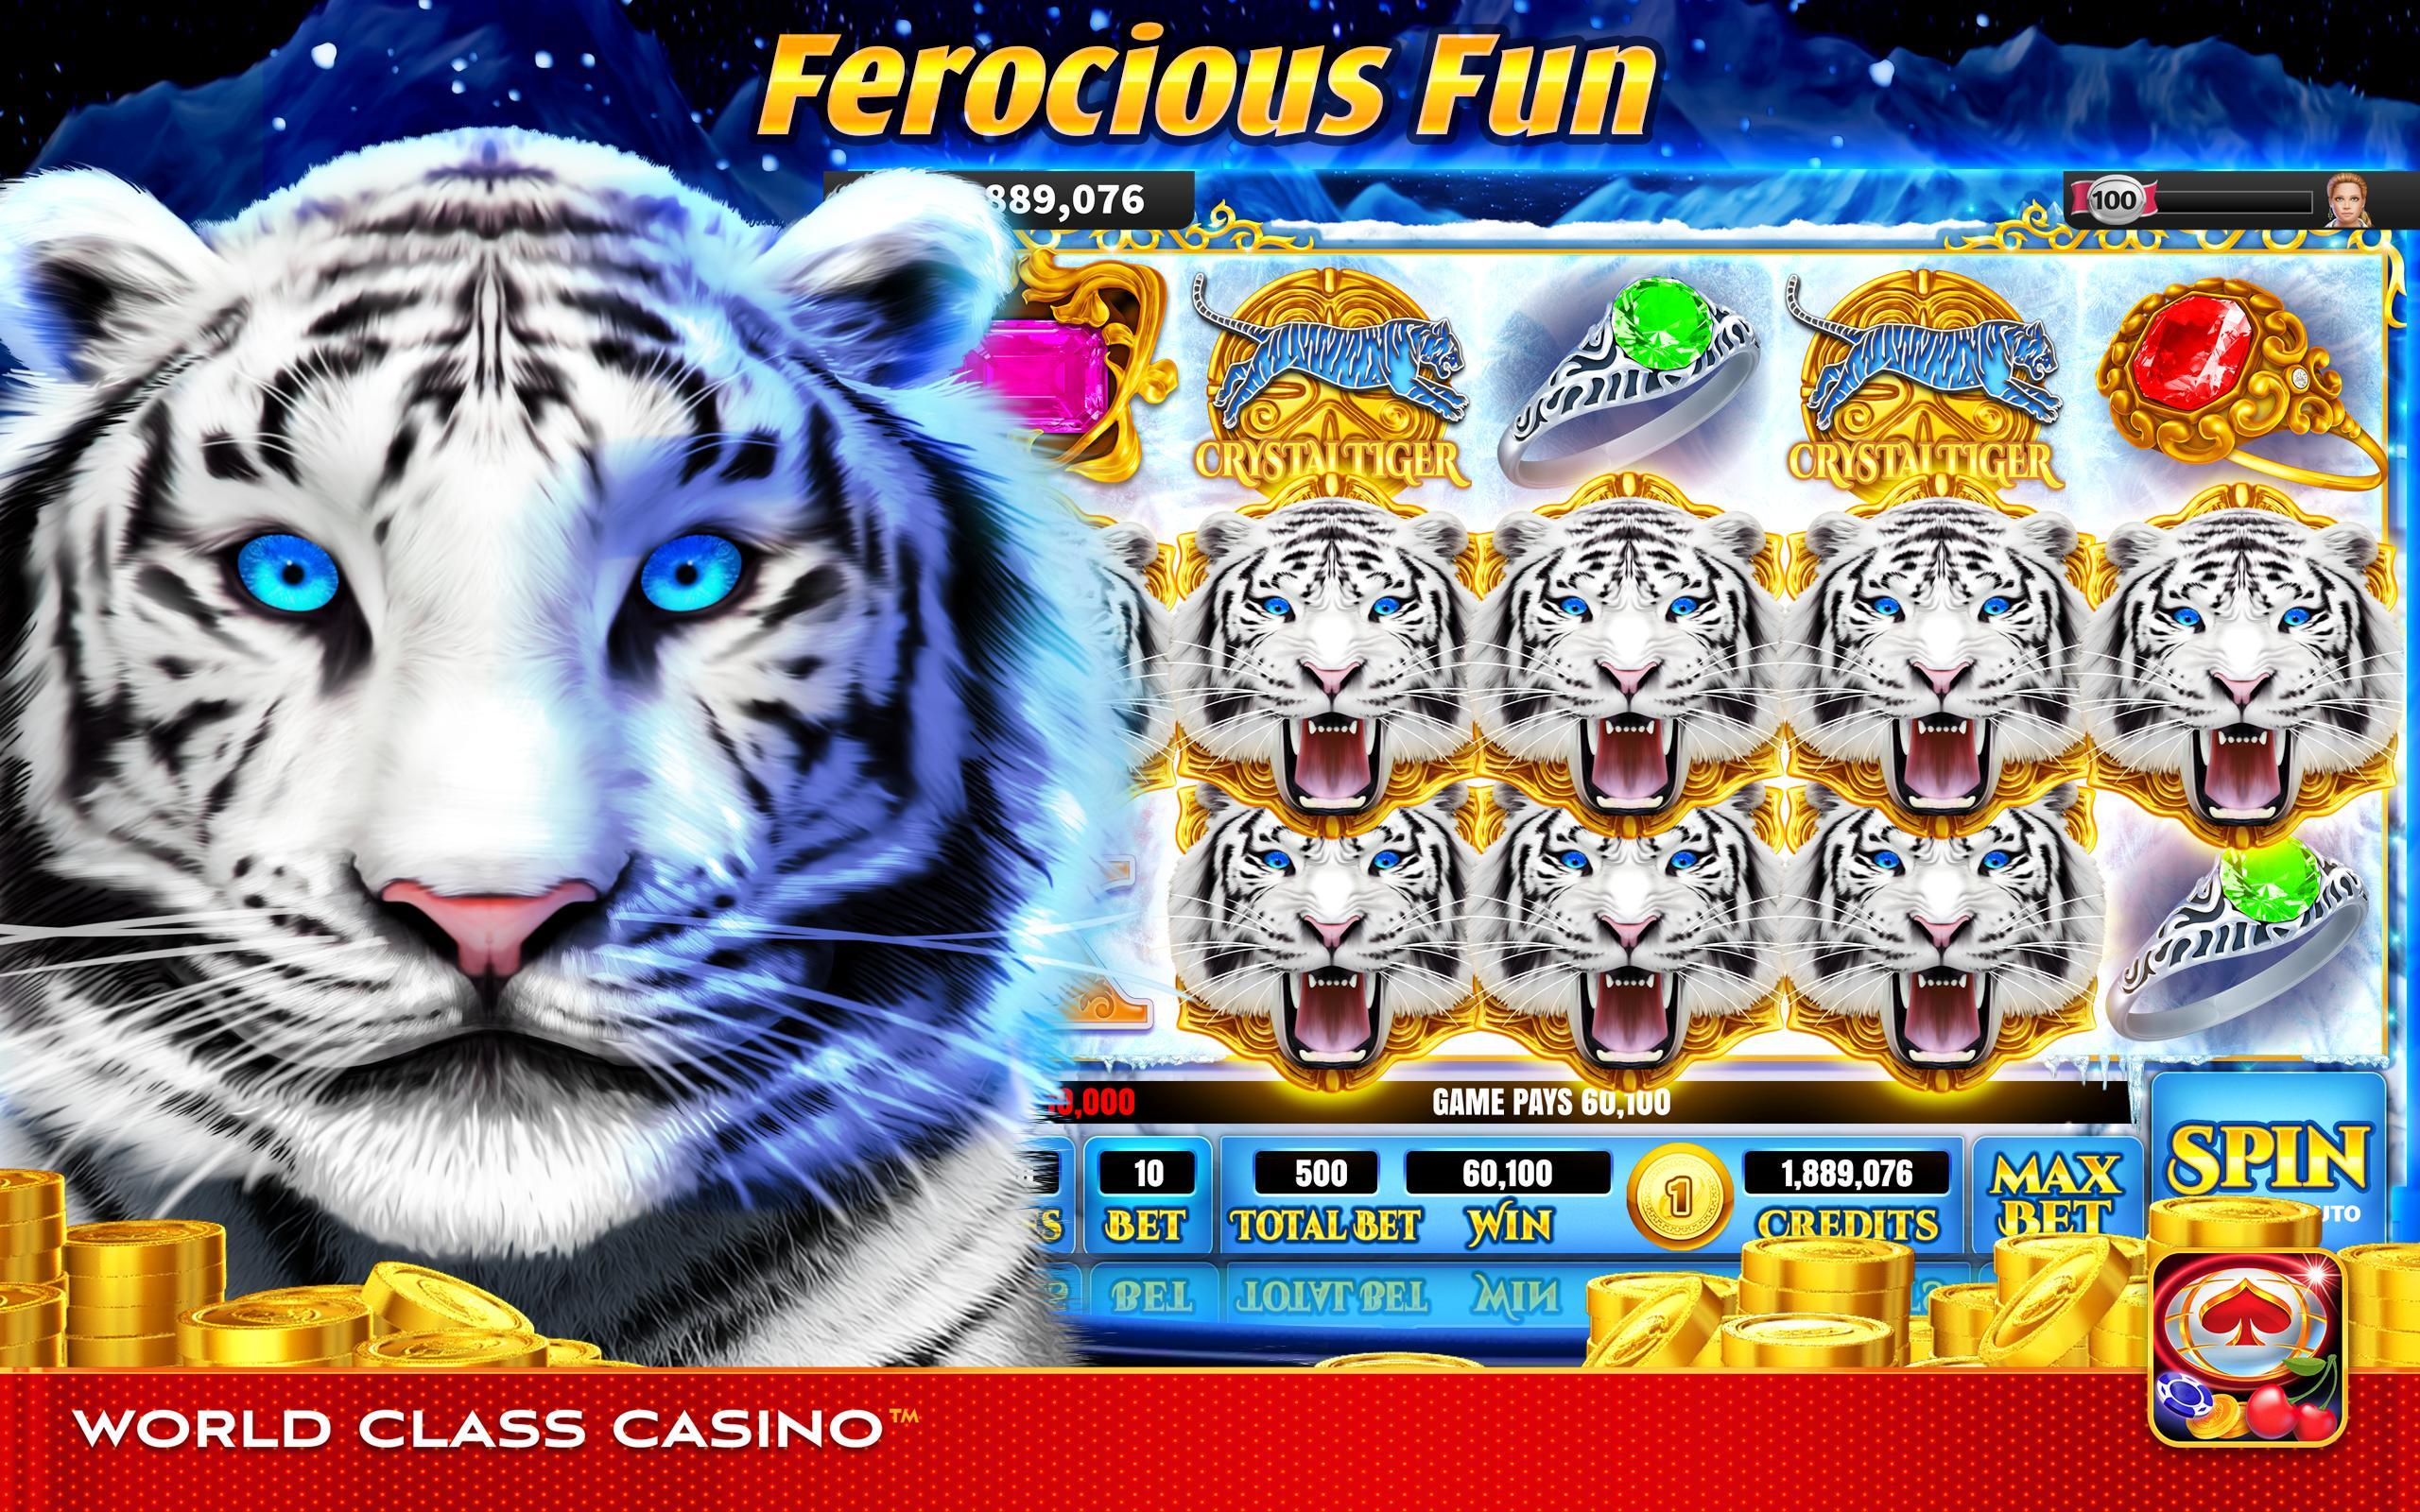 World Class Casino Slots, Blackjack & Poker Room 8.0.4 Screenshot 9